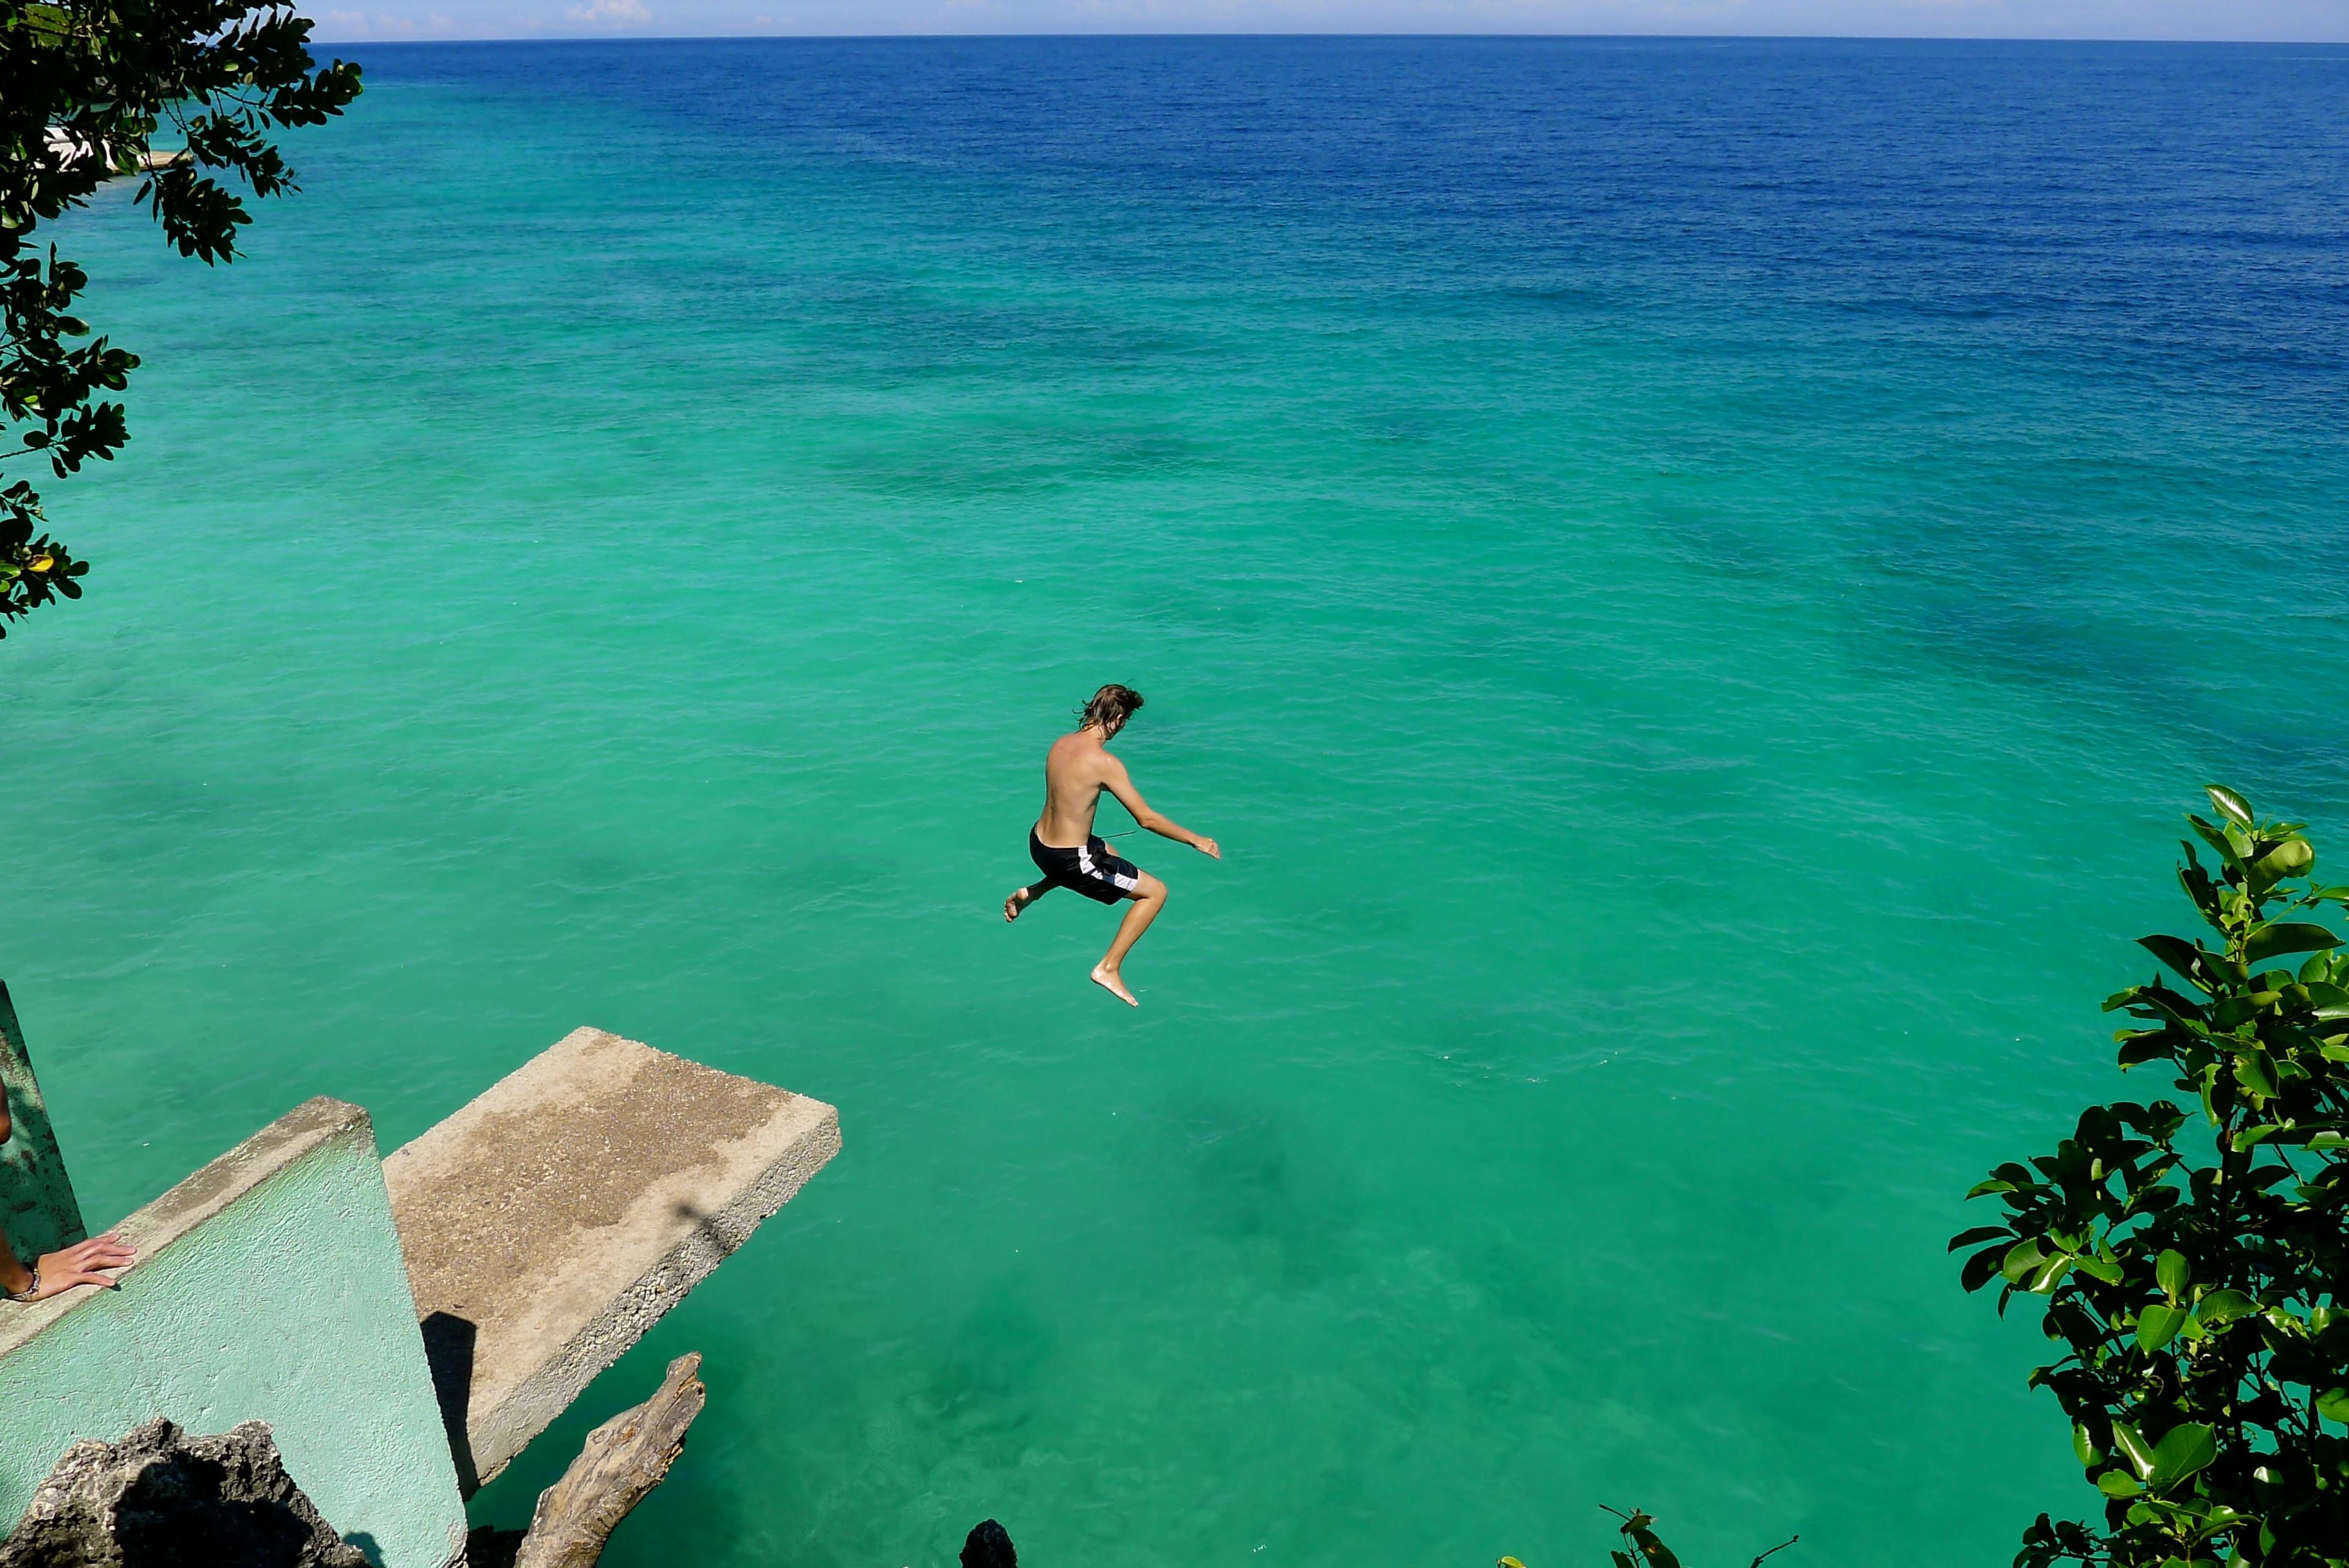 Cliff Diving in Salagdoong Beach Resort, Siquijor. Photo: Fr. Jboy Gonzales SJ